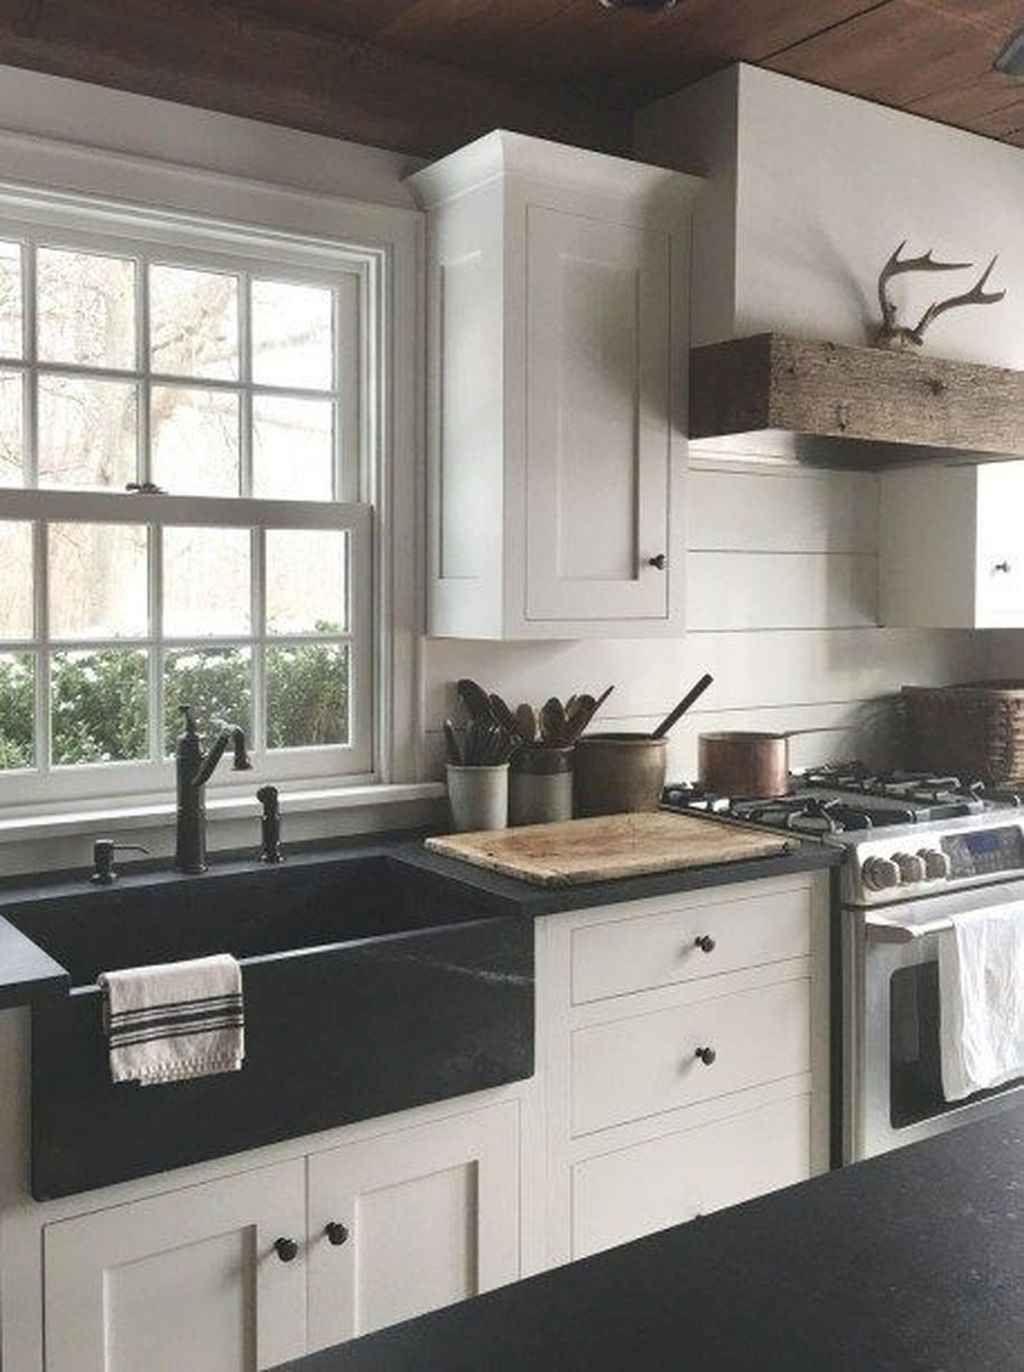 80 Rustic Farmhouse Kitchen Decorating Ideas In 2020 Rustic Kitchen Sinks Farmhouse Sink Kitchen Home Decor Kitchen